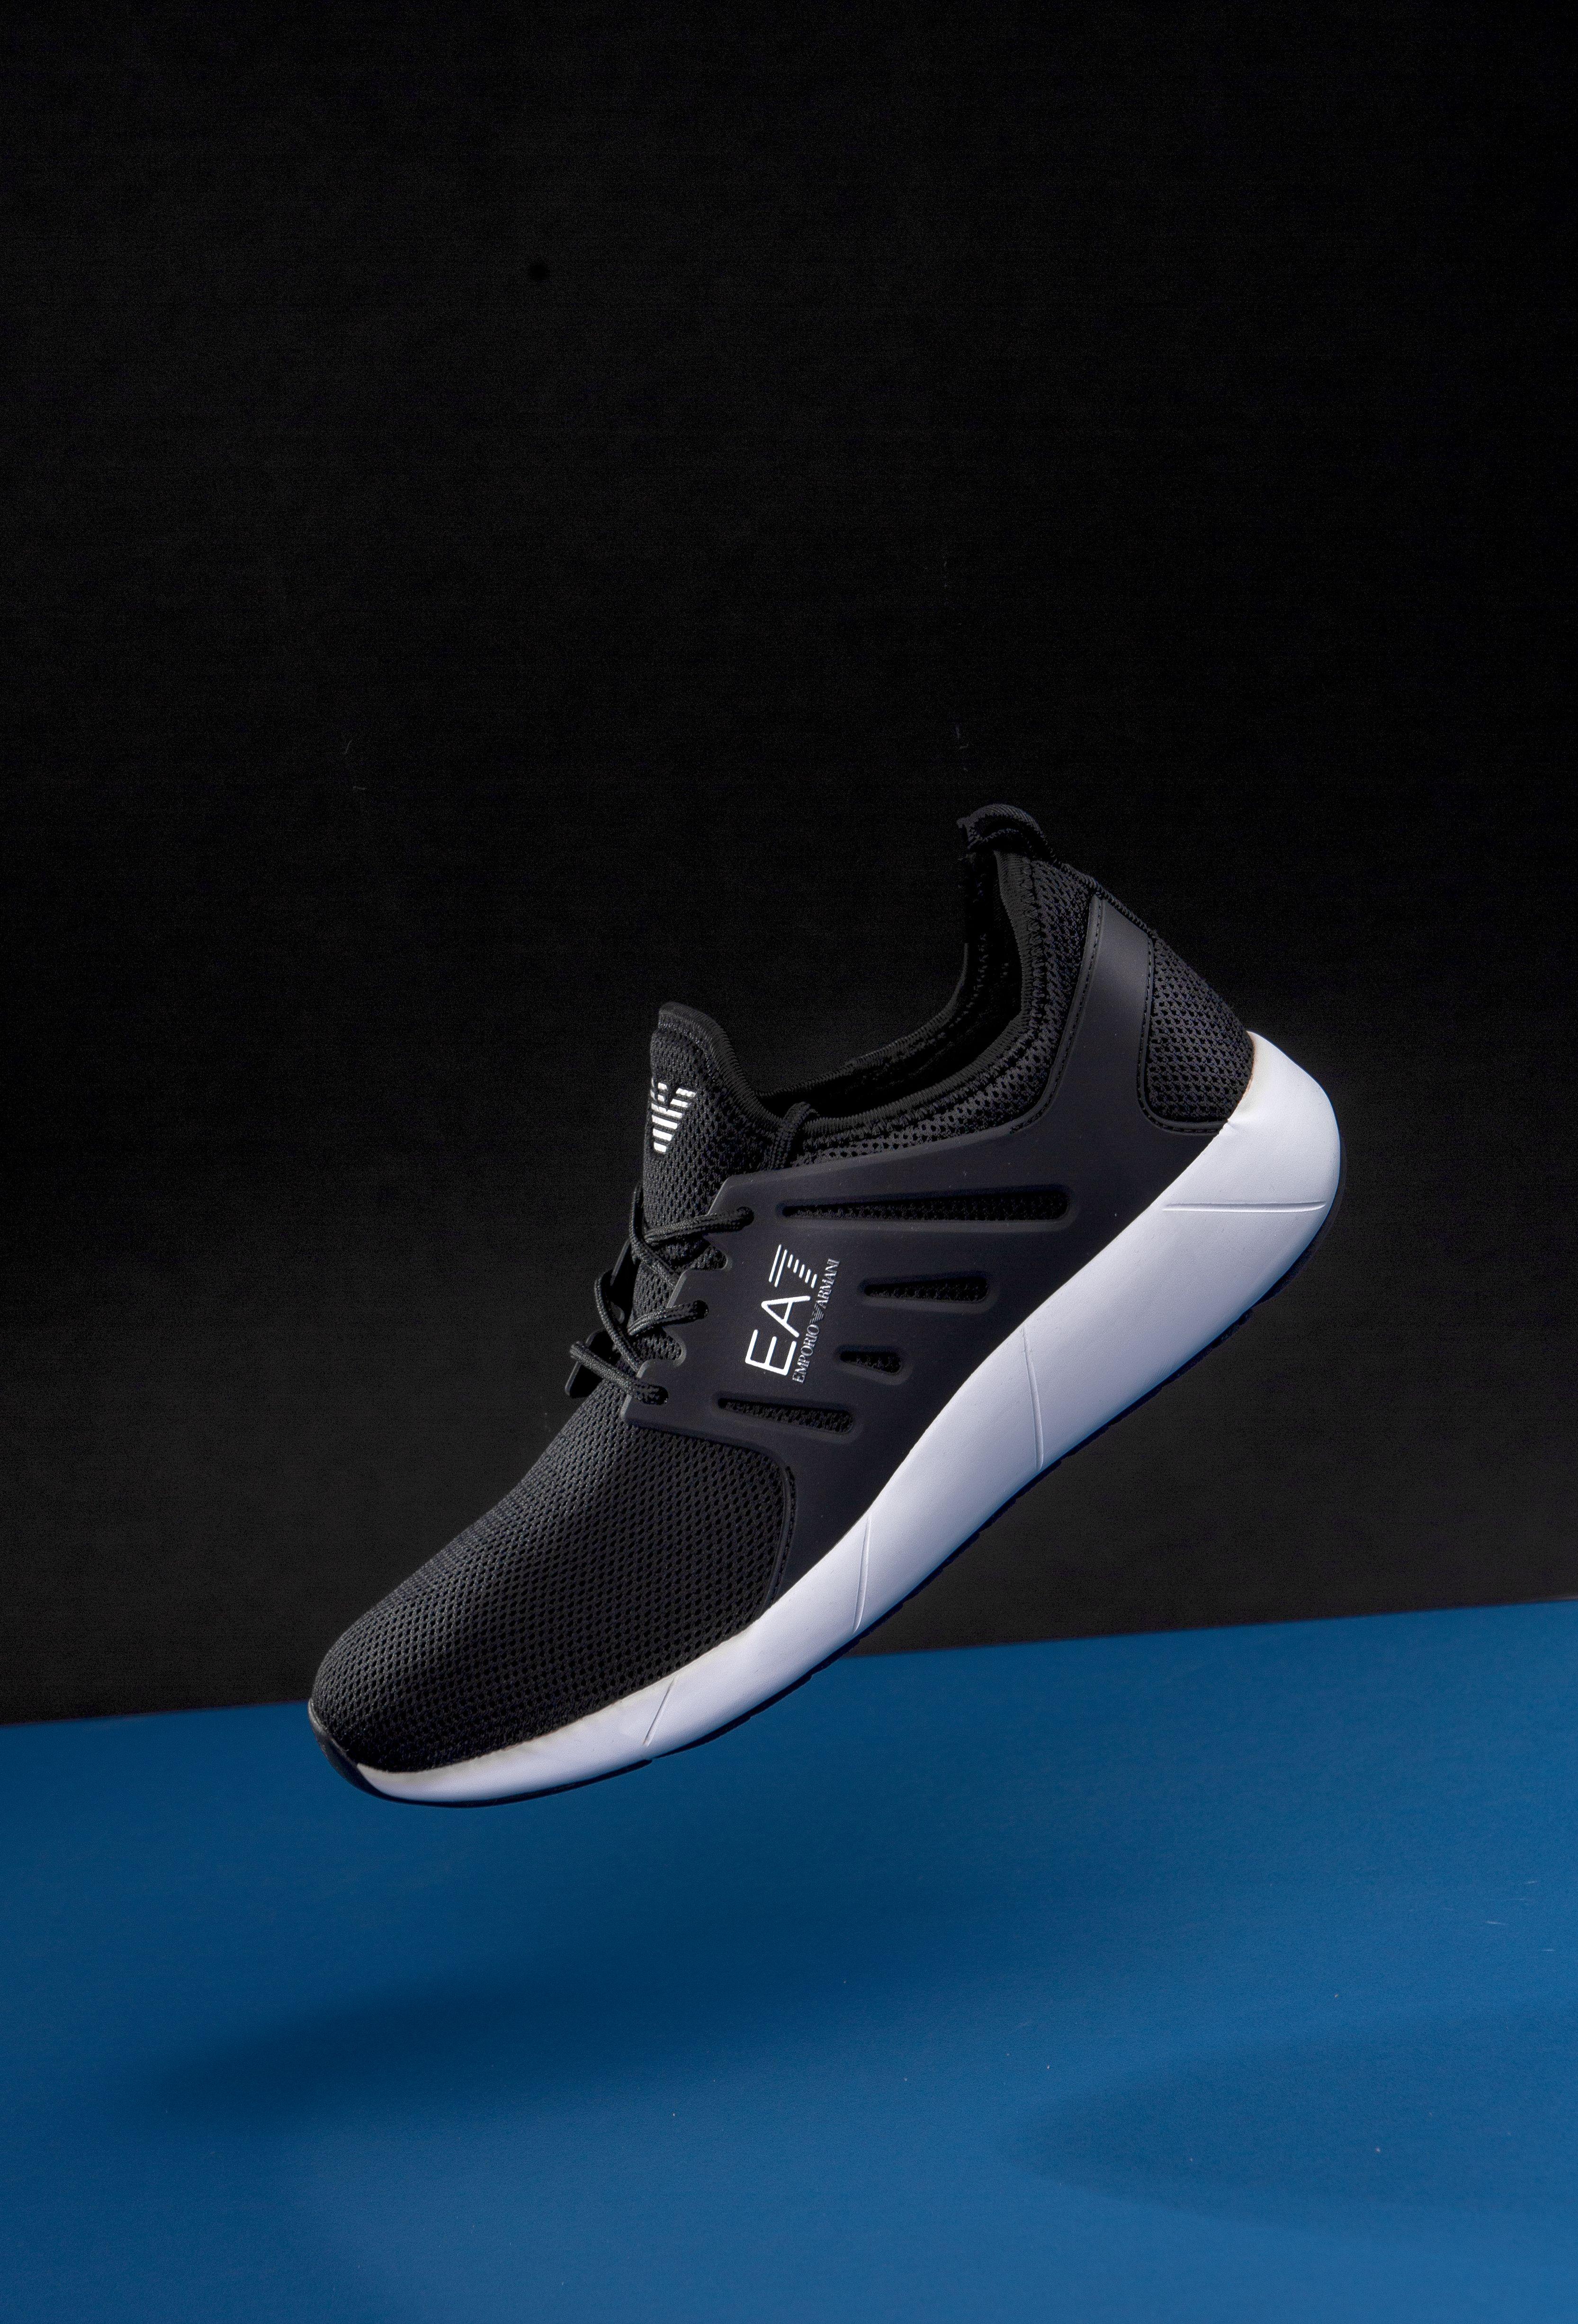 Ea7 Emporio Armani Shoes Emporio Armani Armani Shoes